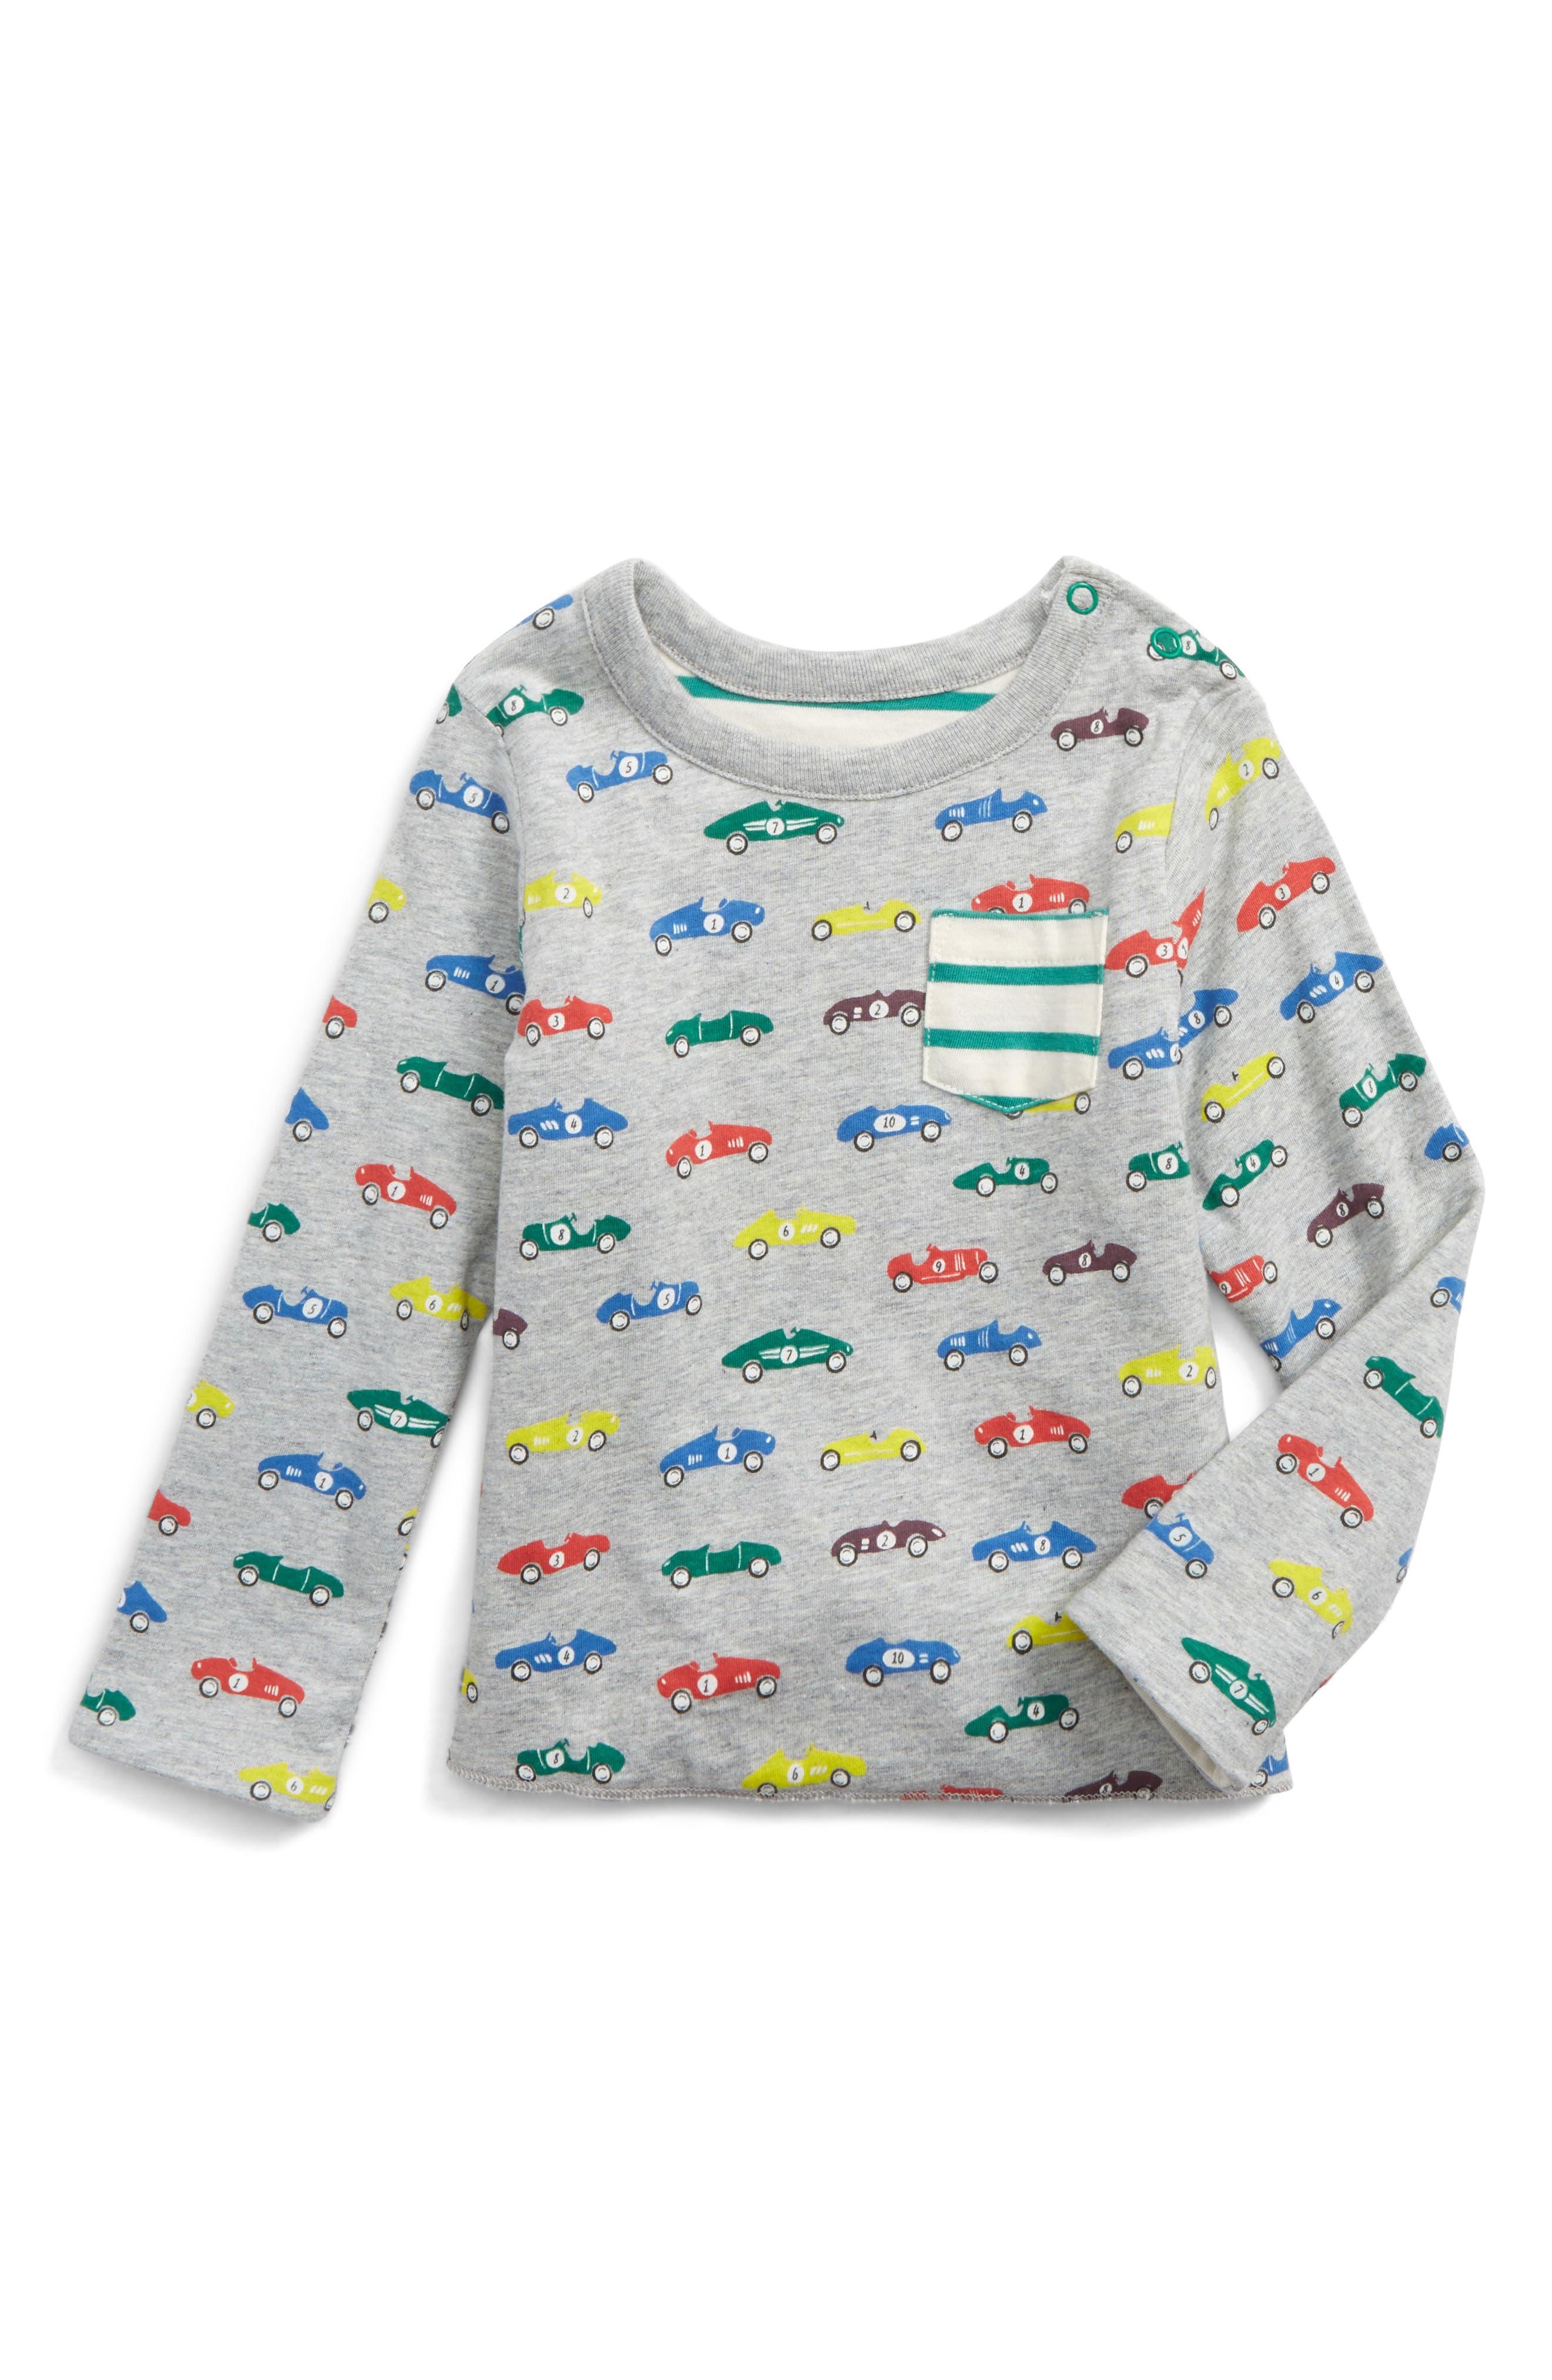 Alternate Image 1 Selected - Mini Boden Reversible Print T-Shirt (Baby Boys & Toddler Boys)